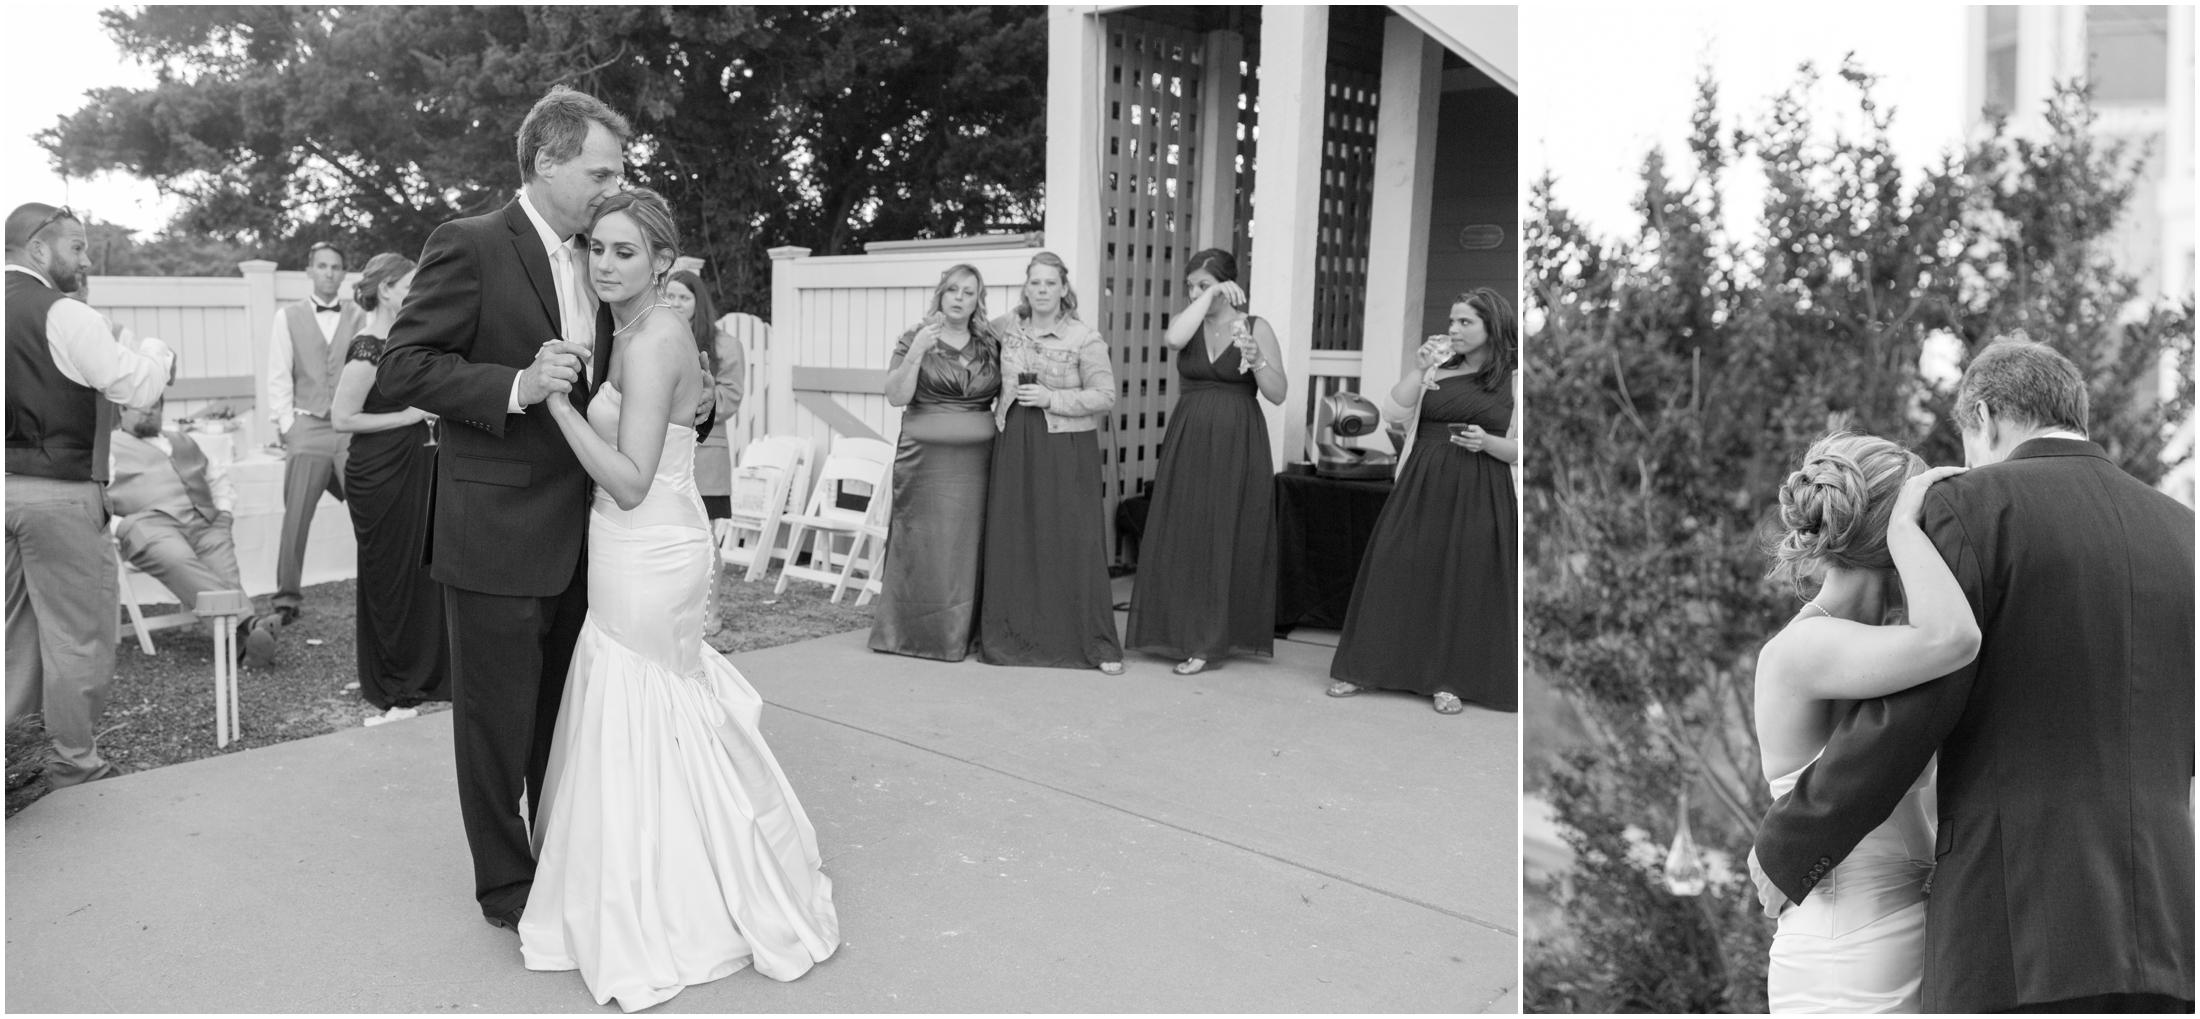 Pearce-Wedding-Reception-1120.jpg